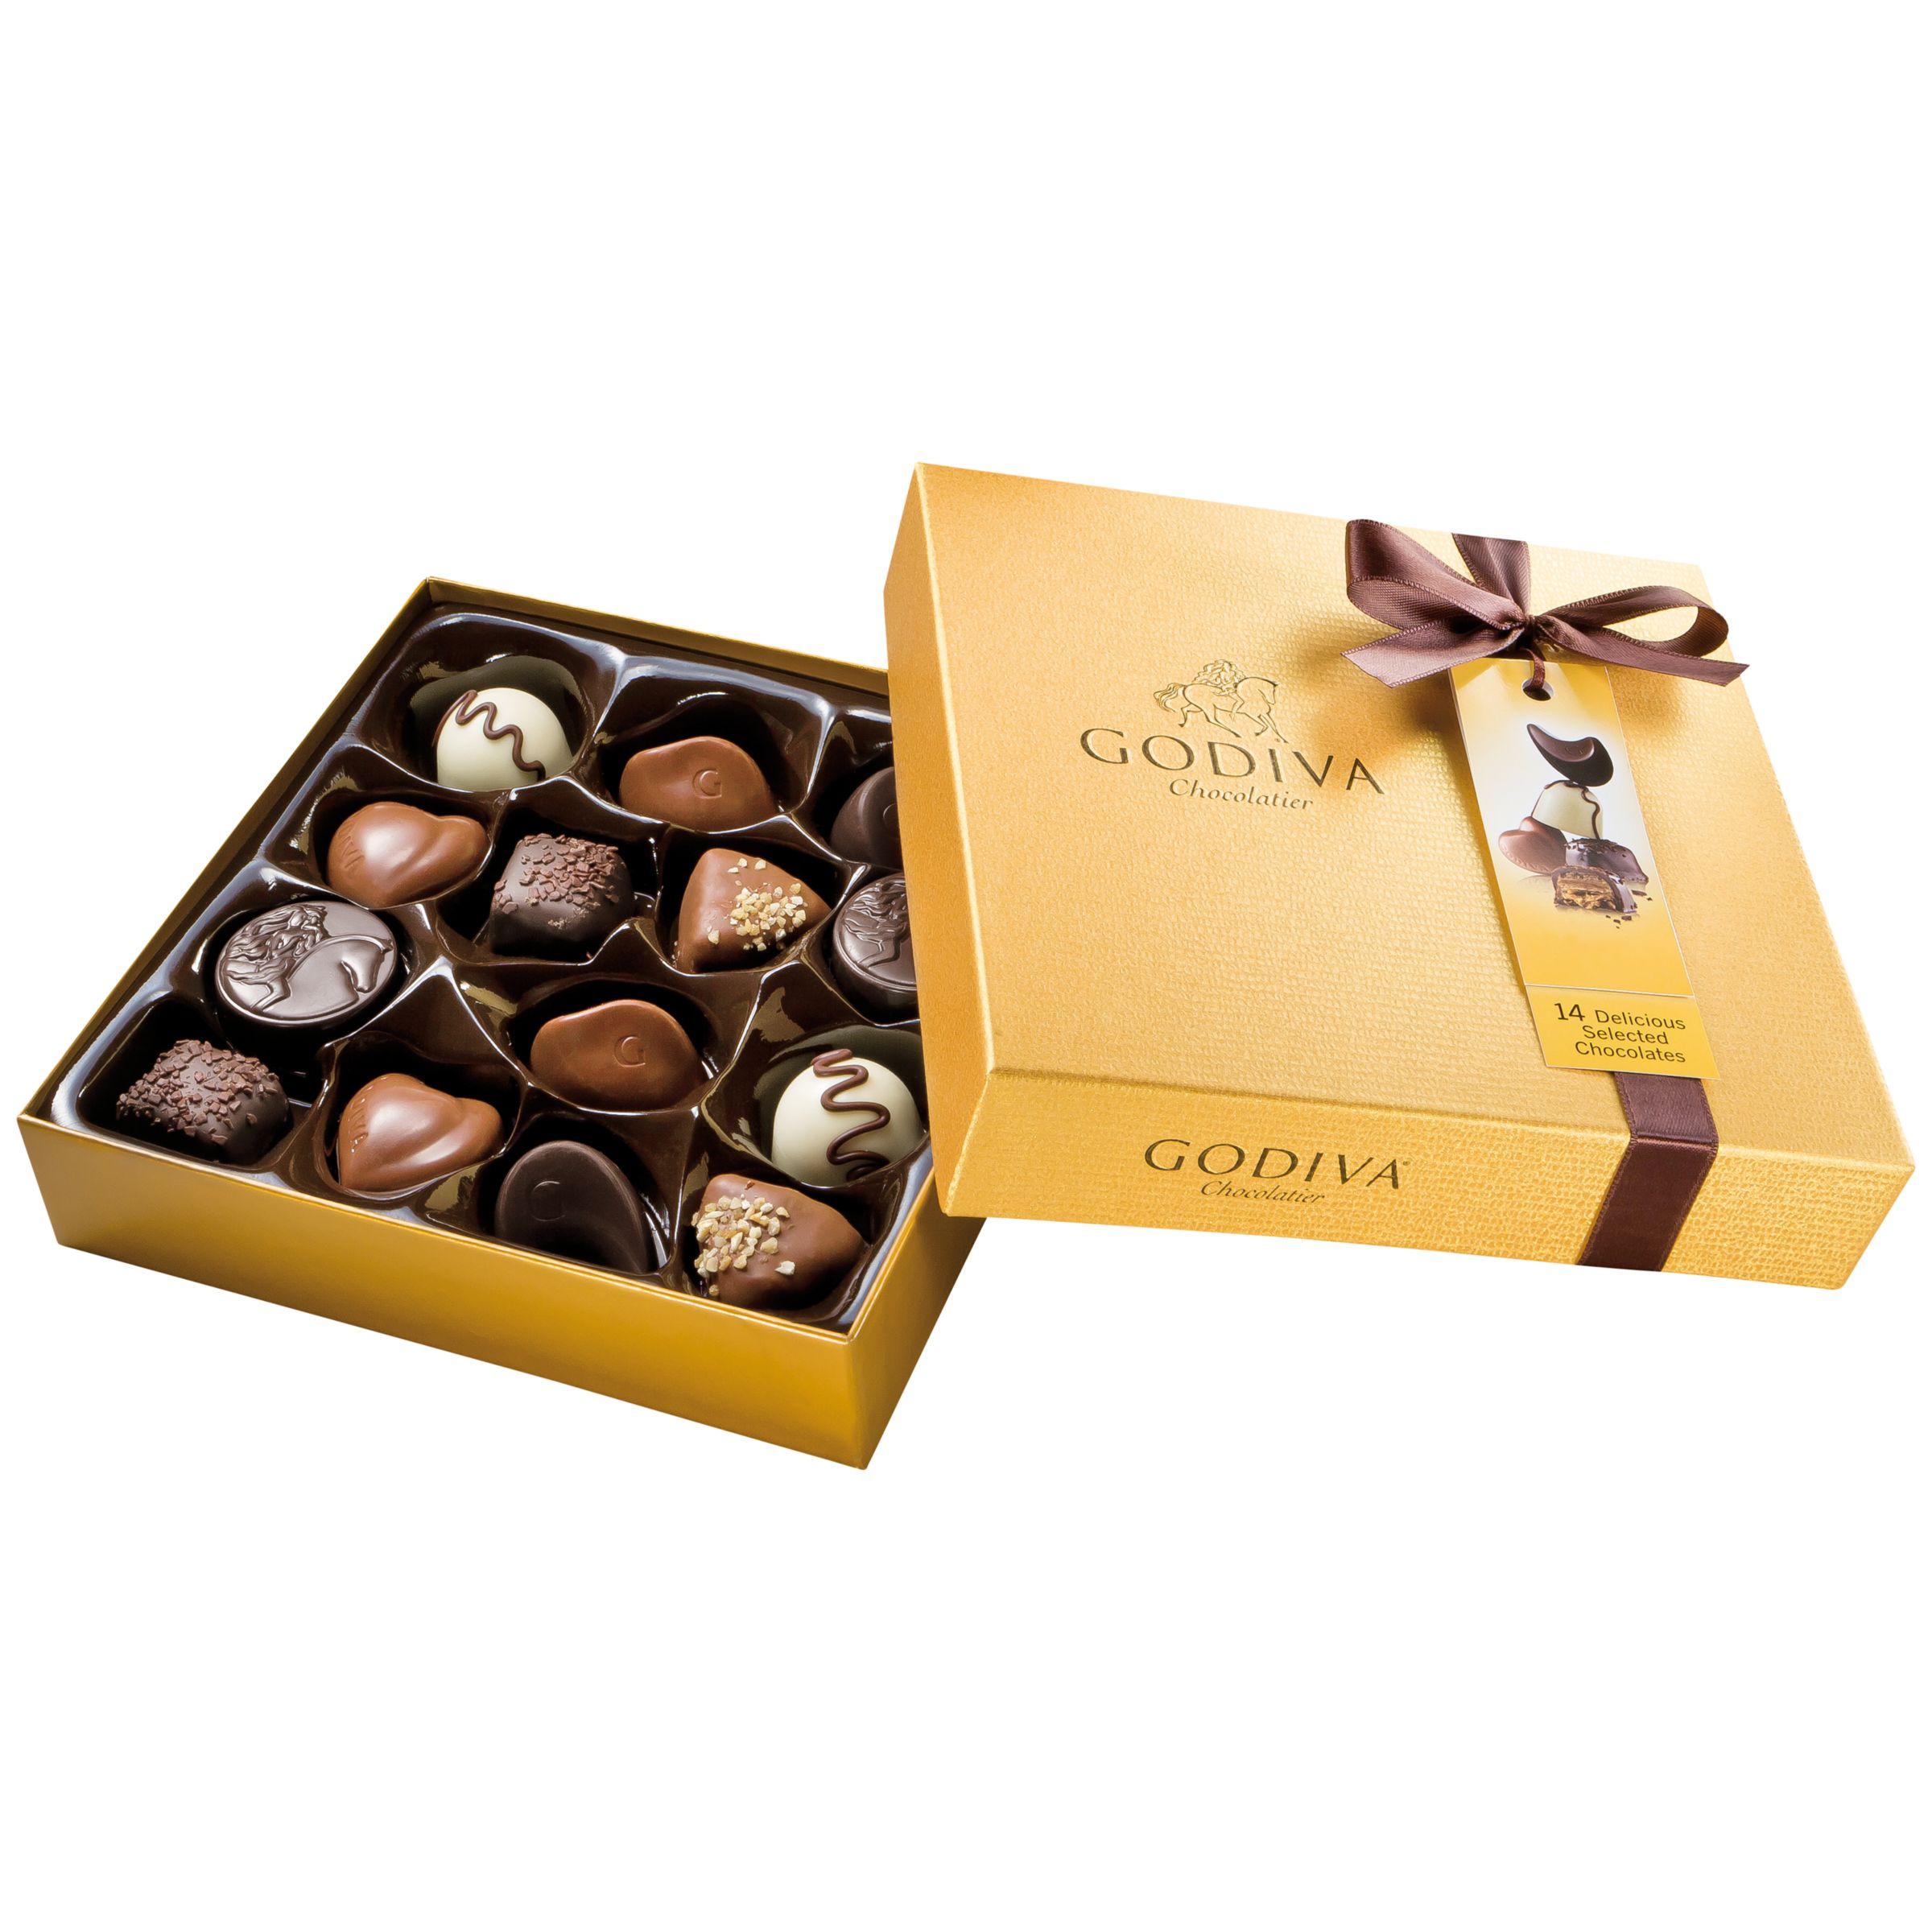 Godiva Godiva Gold Chocolate Box, 165g